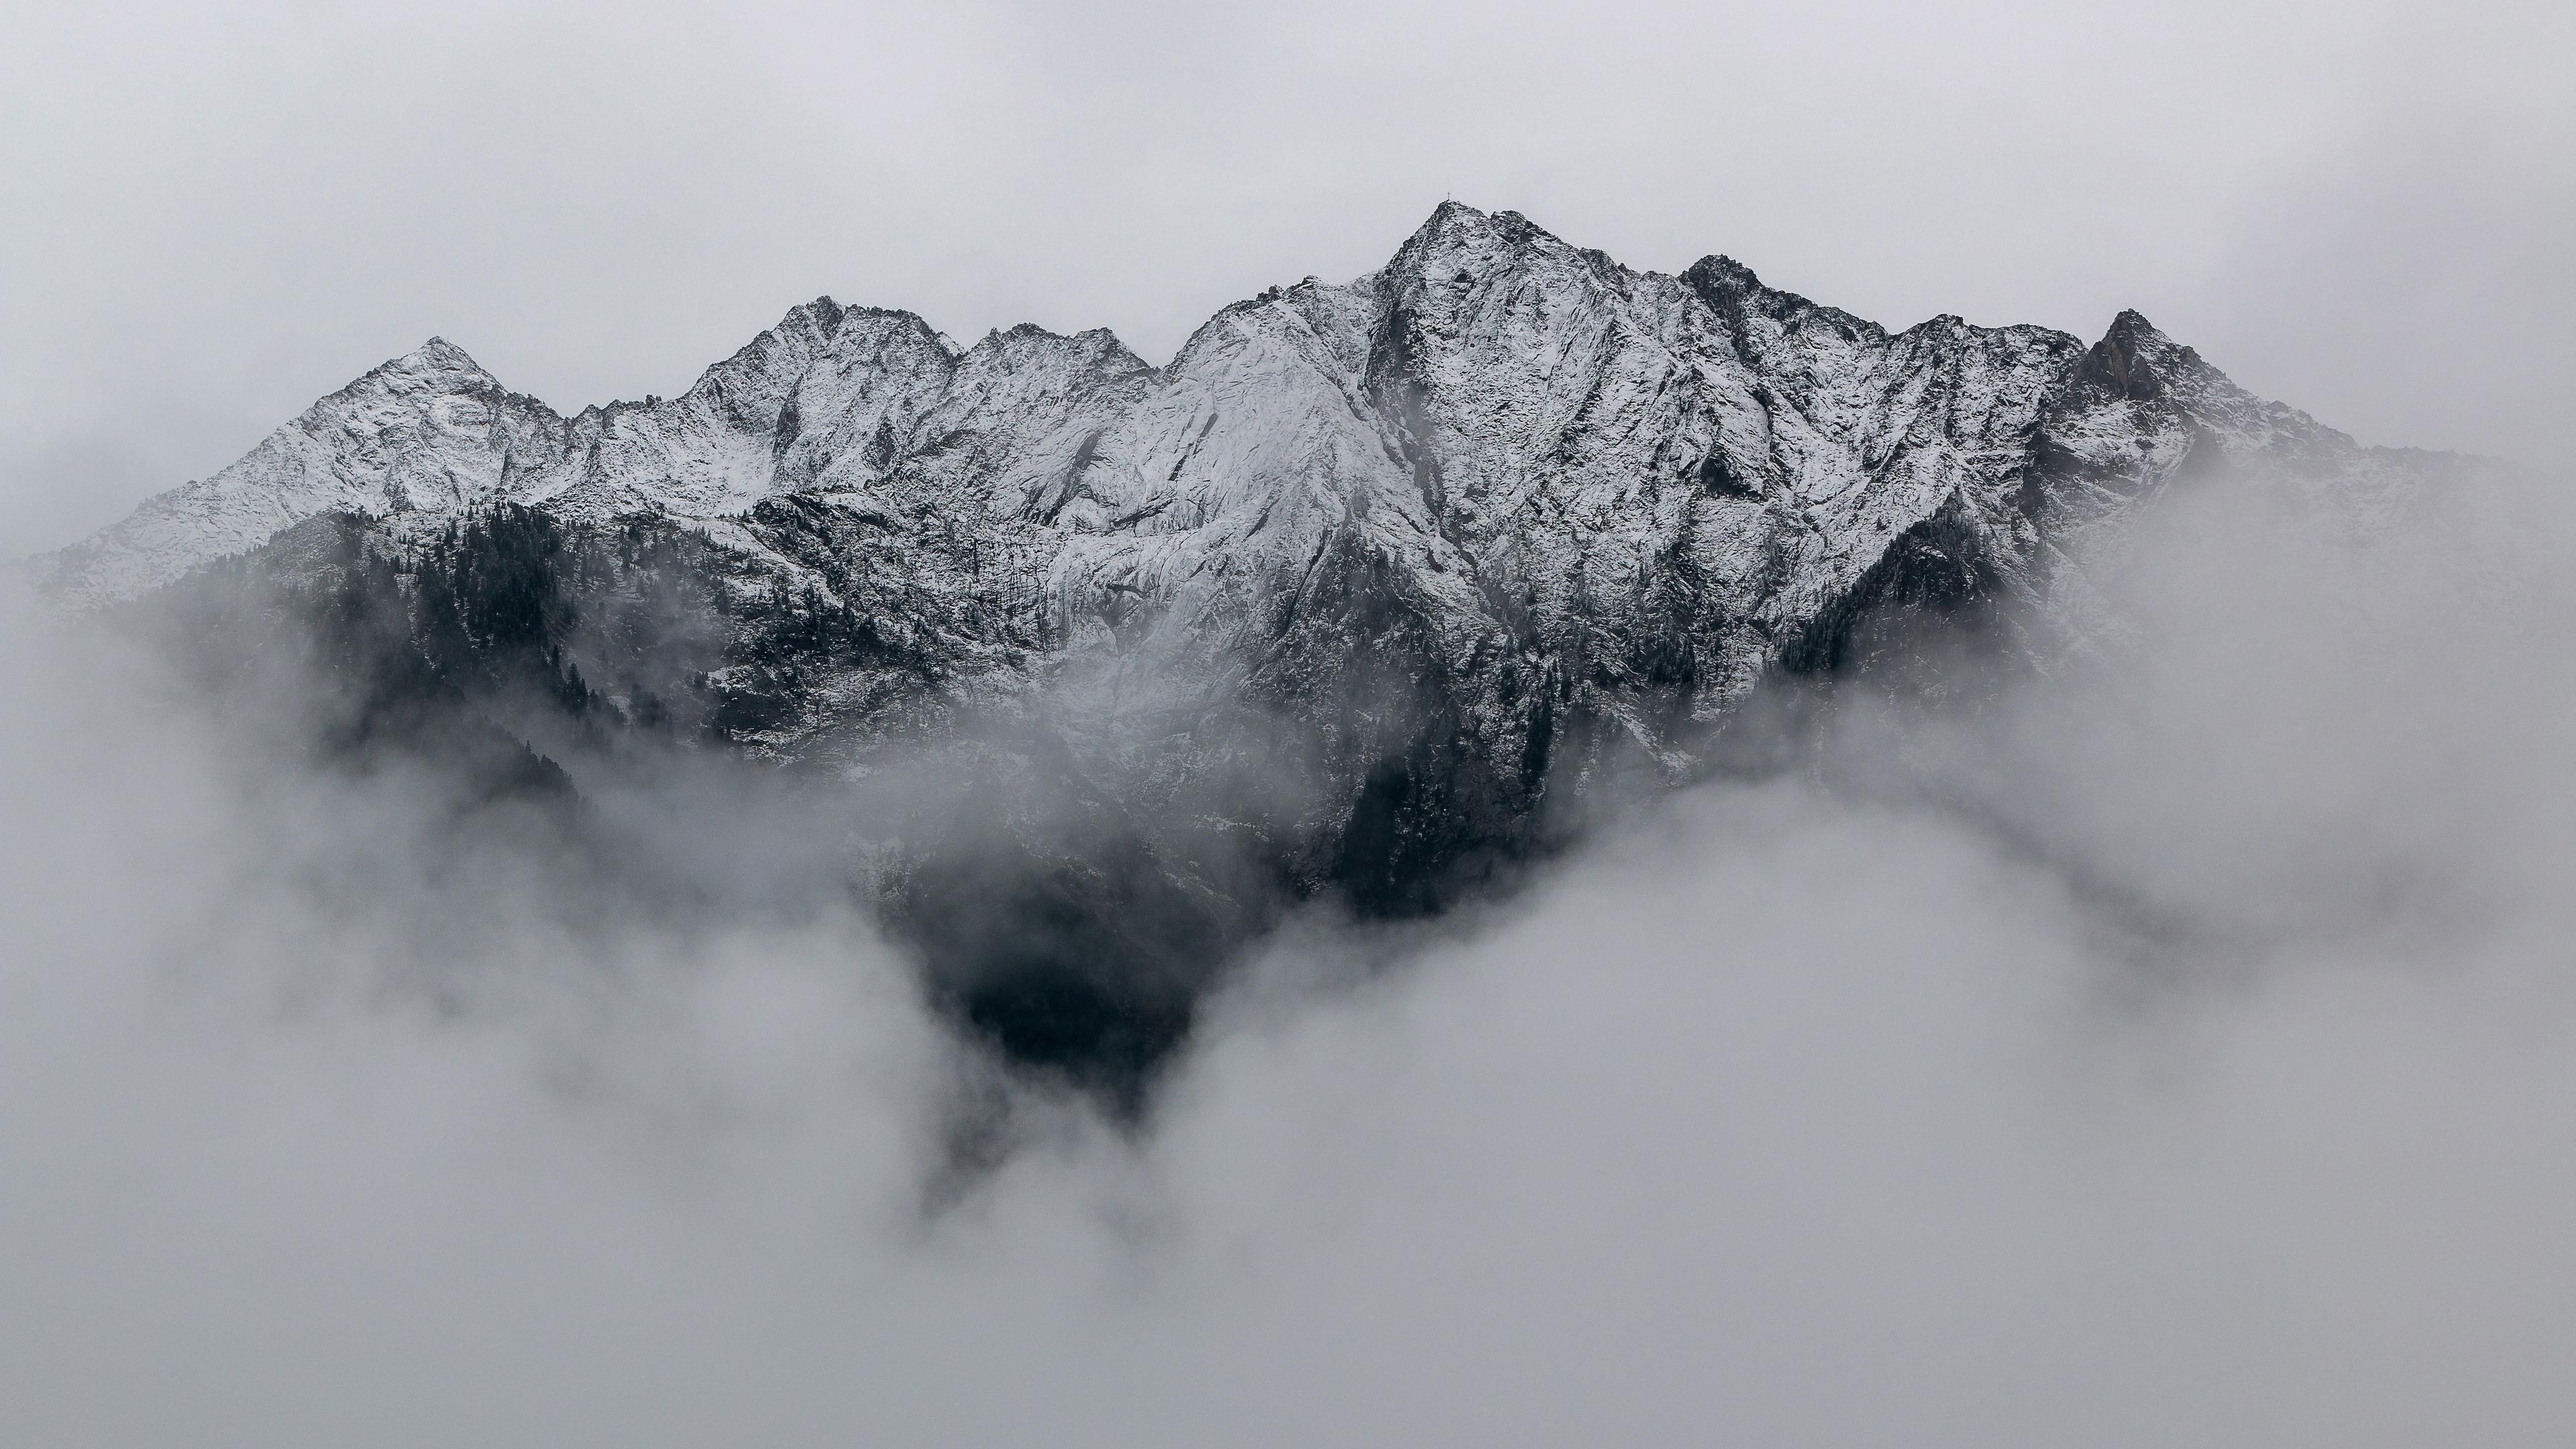 Wallpaper 4k Mountains Covered In Snow 4k 4k Wallpapers 5k